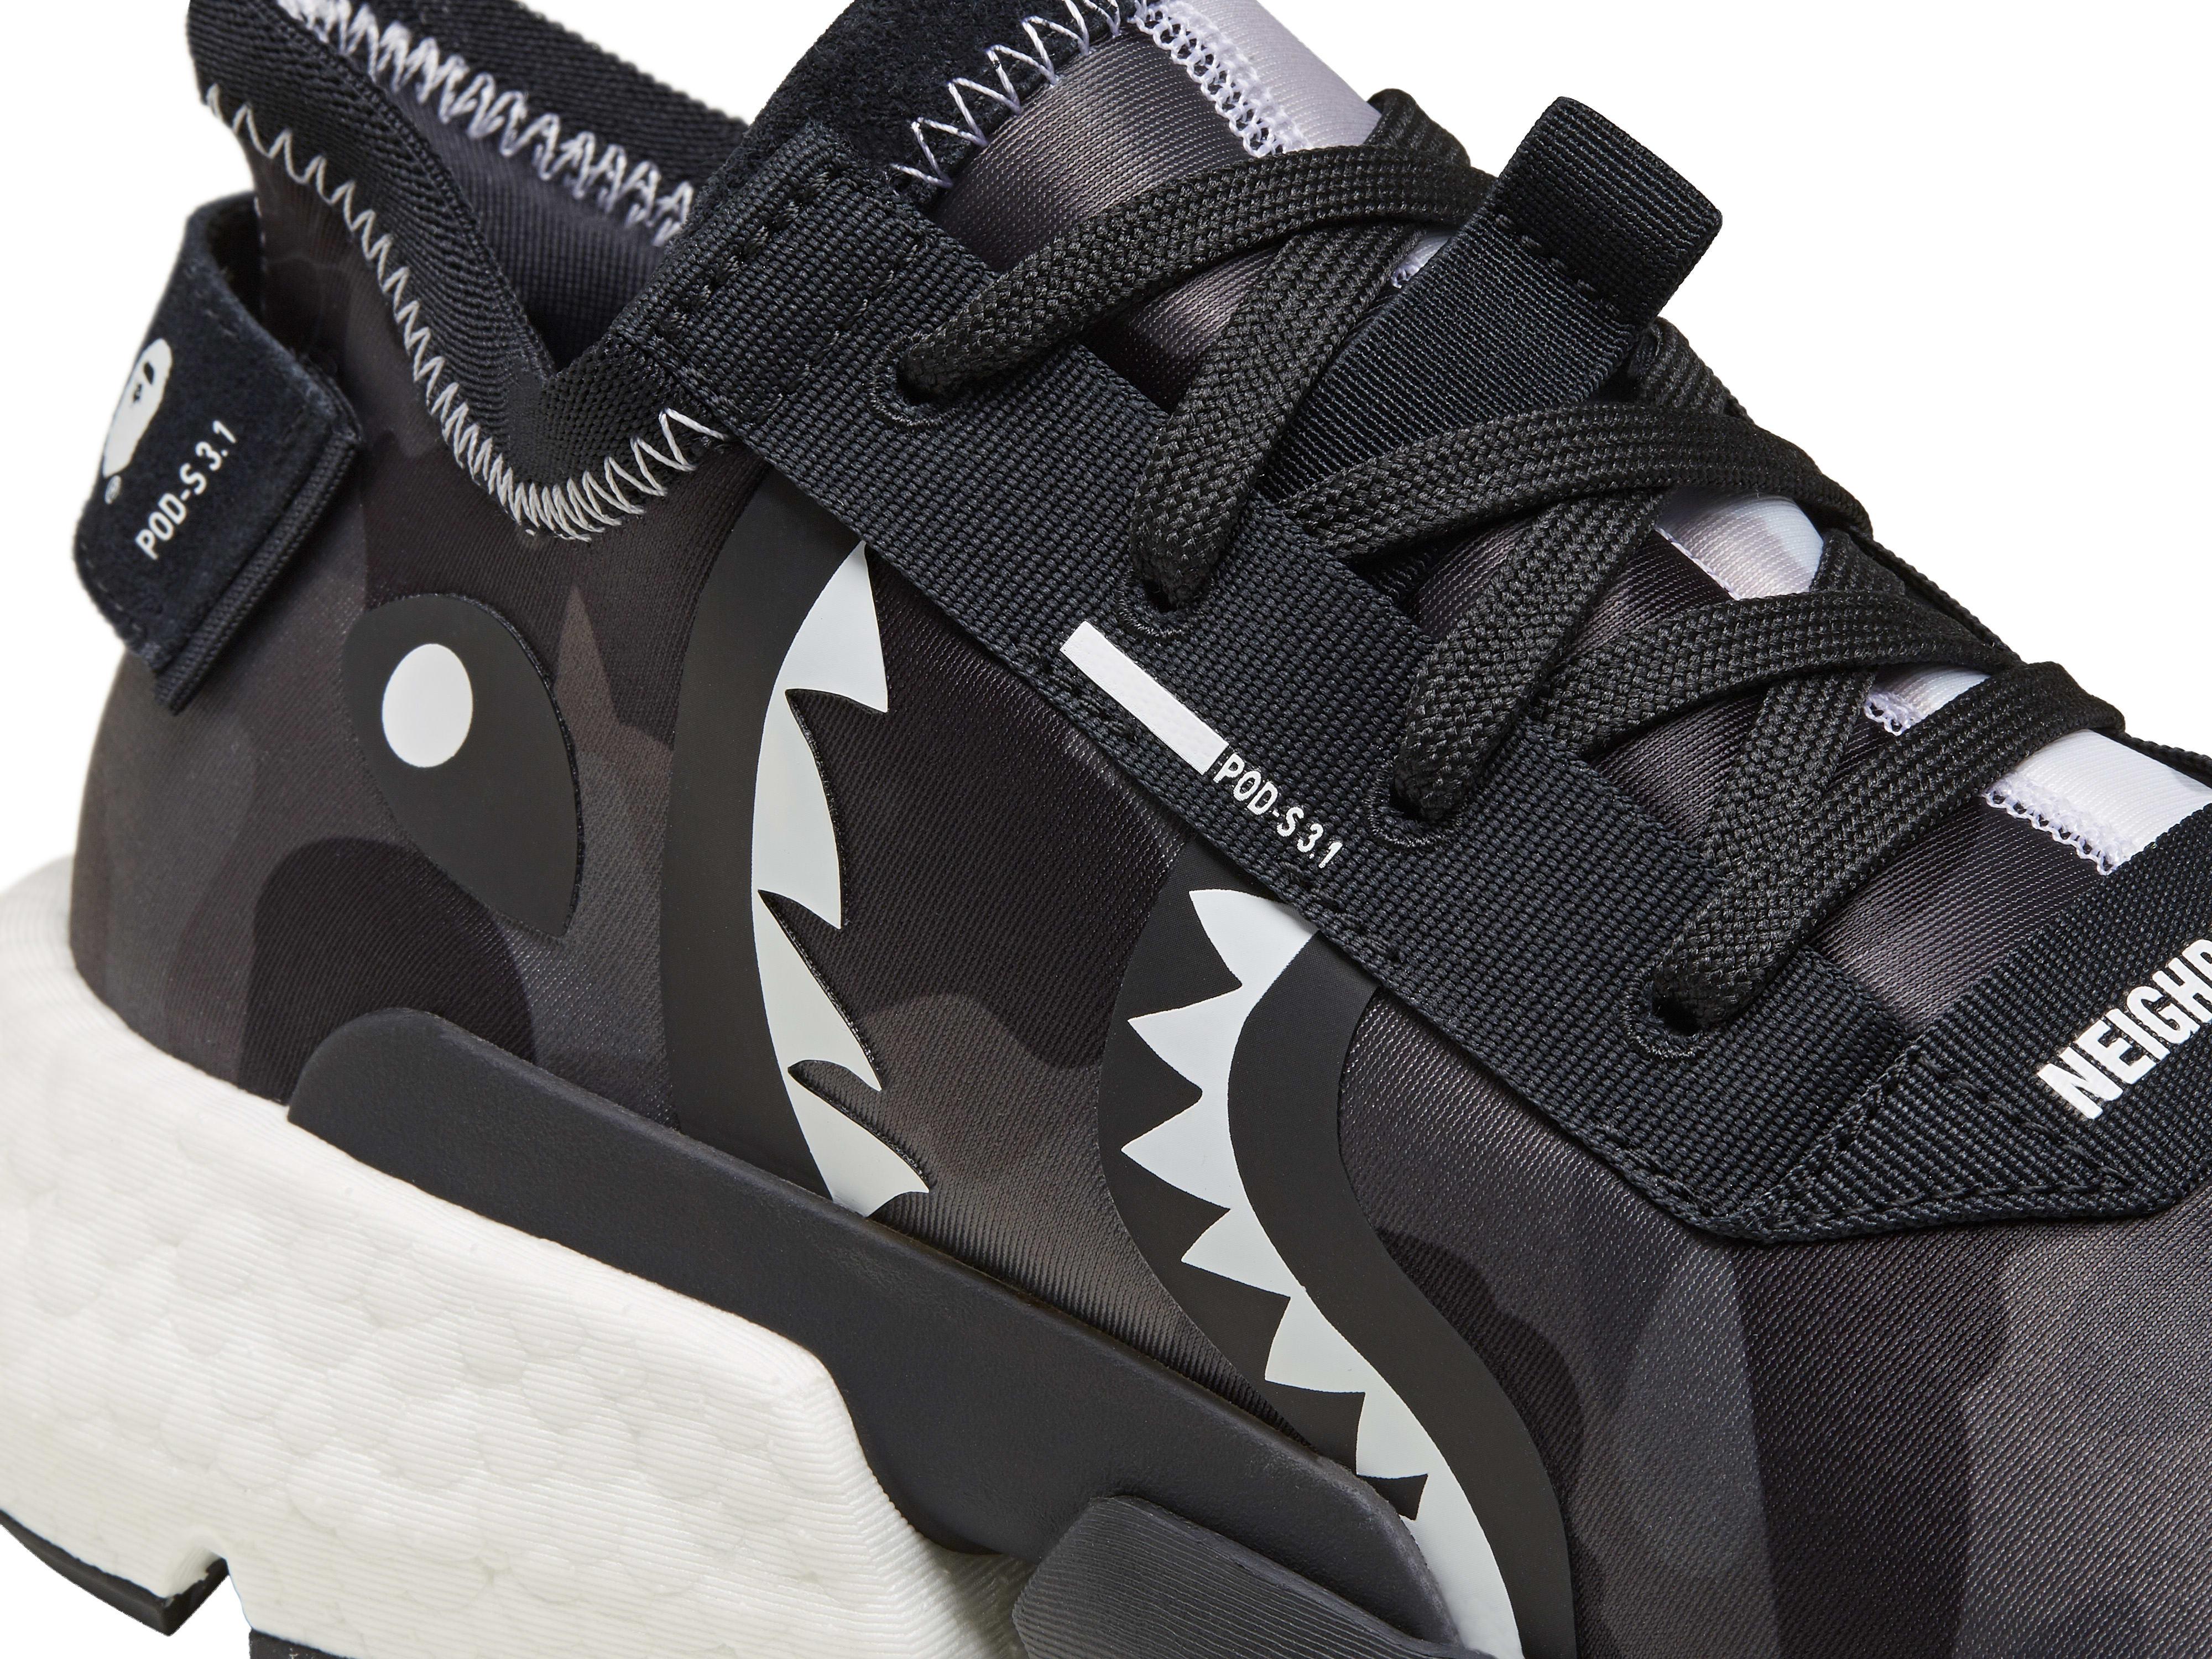 bape neighborhood adidas pod 3 1 ee9431 detail   Kingsizemag